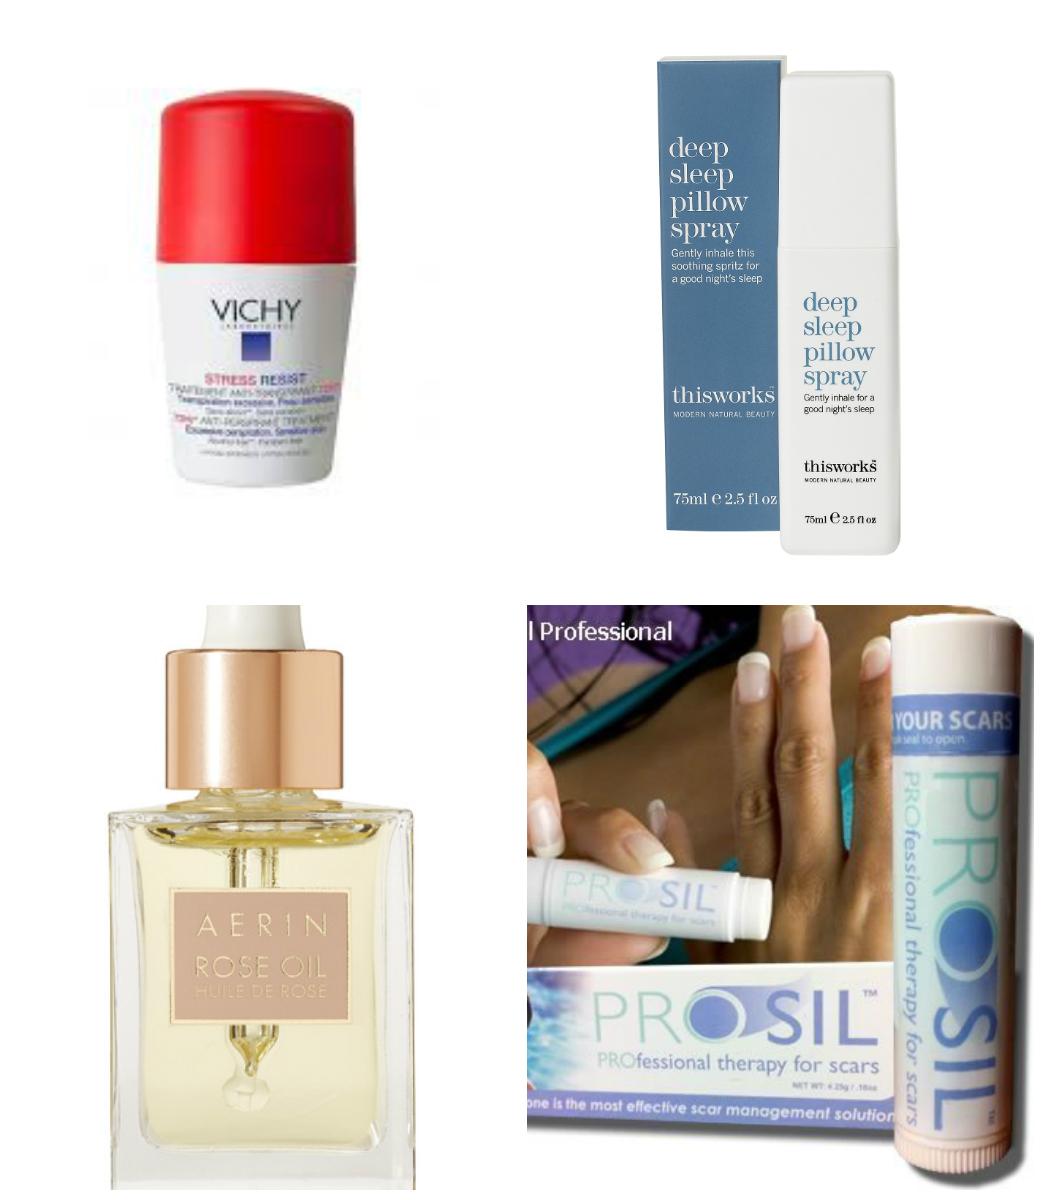 Julia's November Favorites From Aerin, Vichy + More